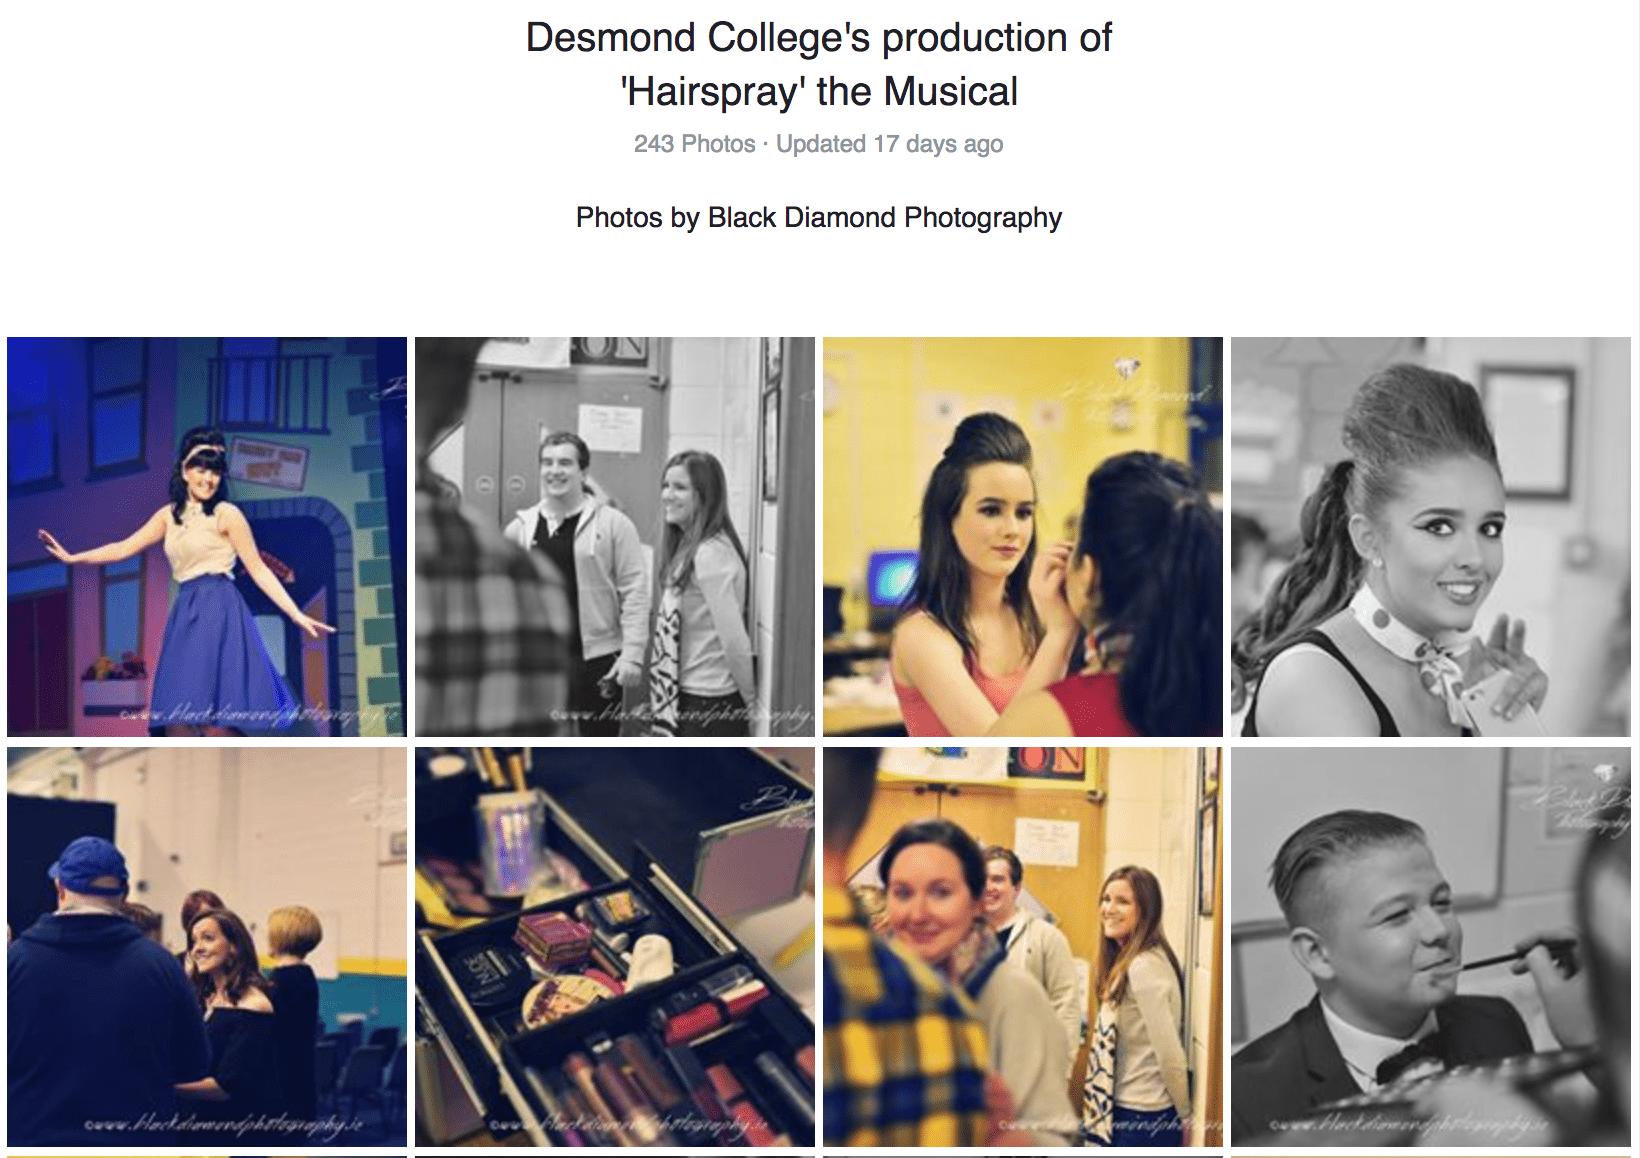 Black Diamond Photography: Photos of Desmond College School Musical Hairspray! Nov 2016